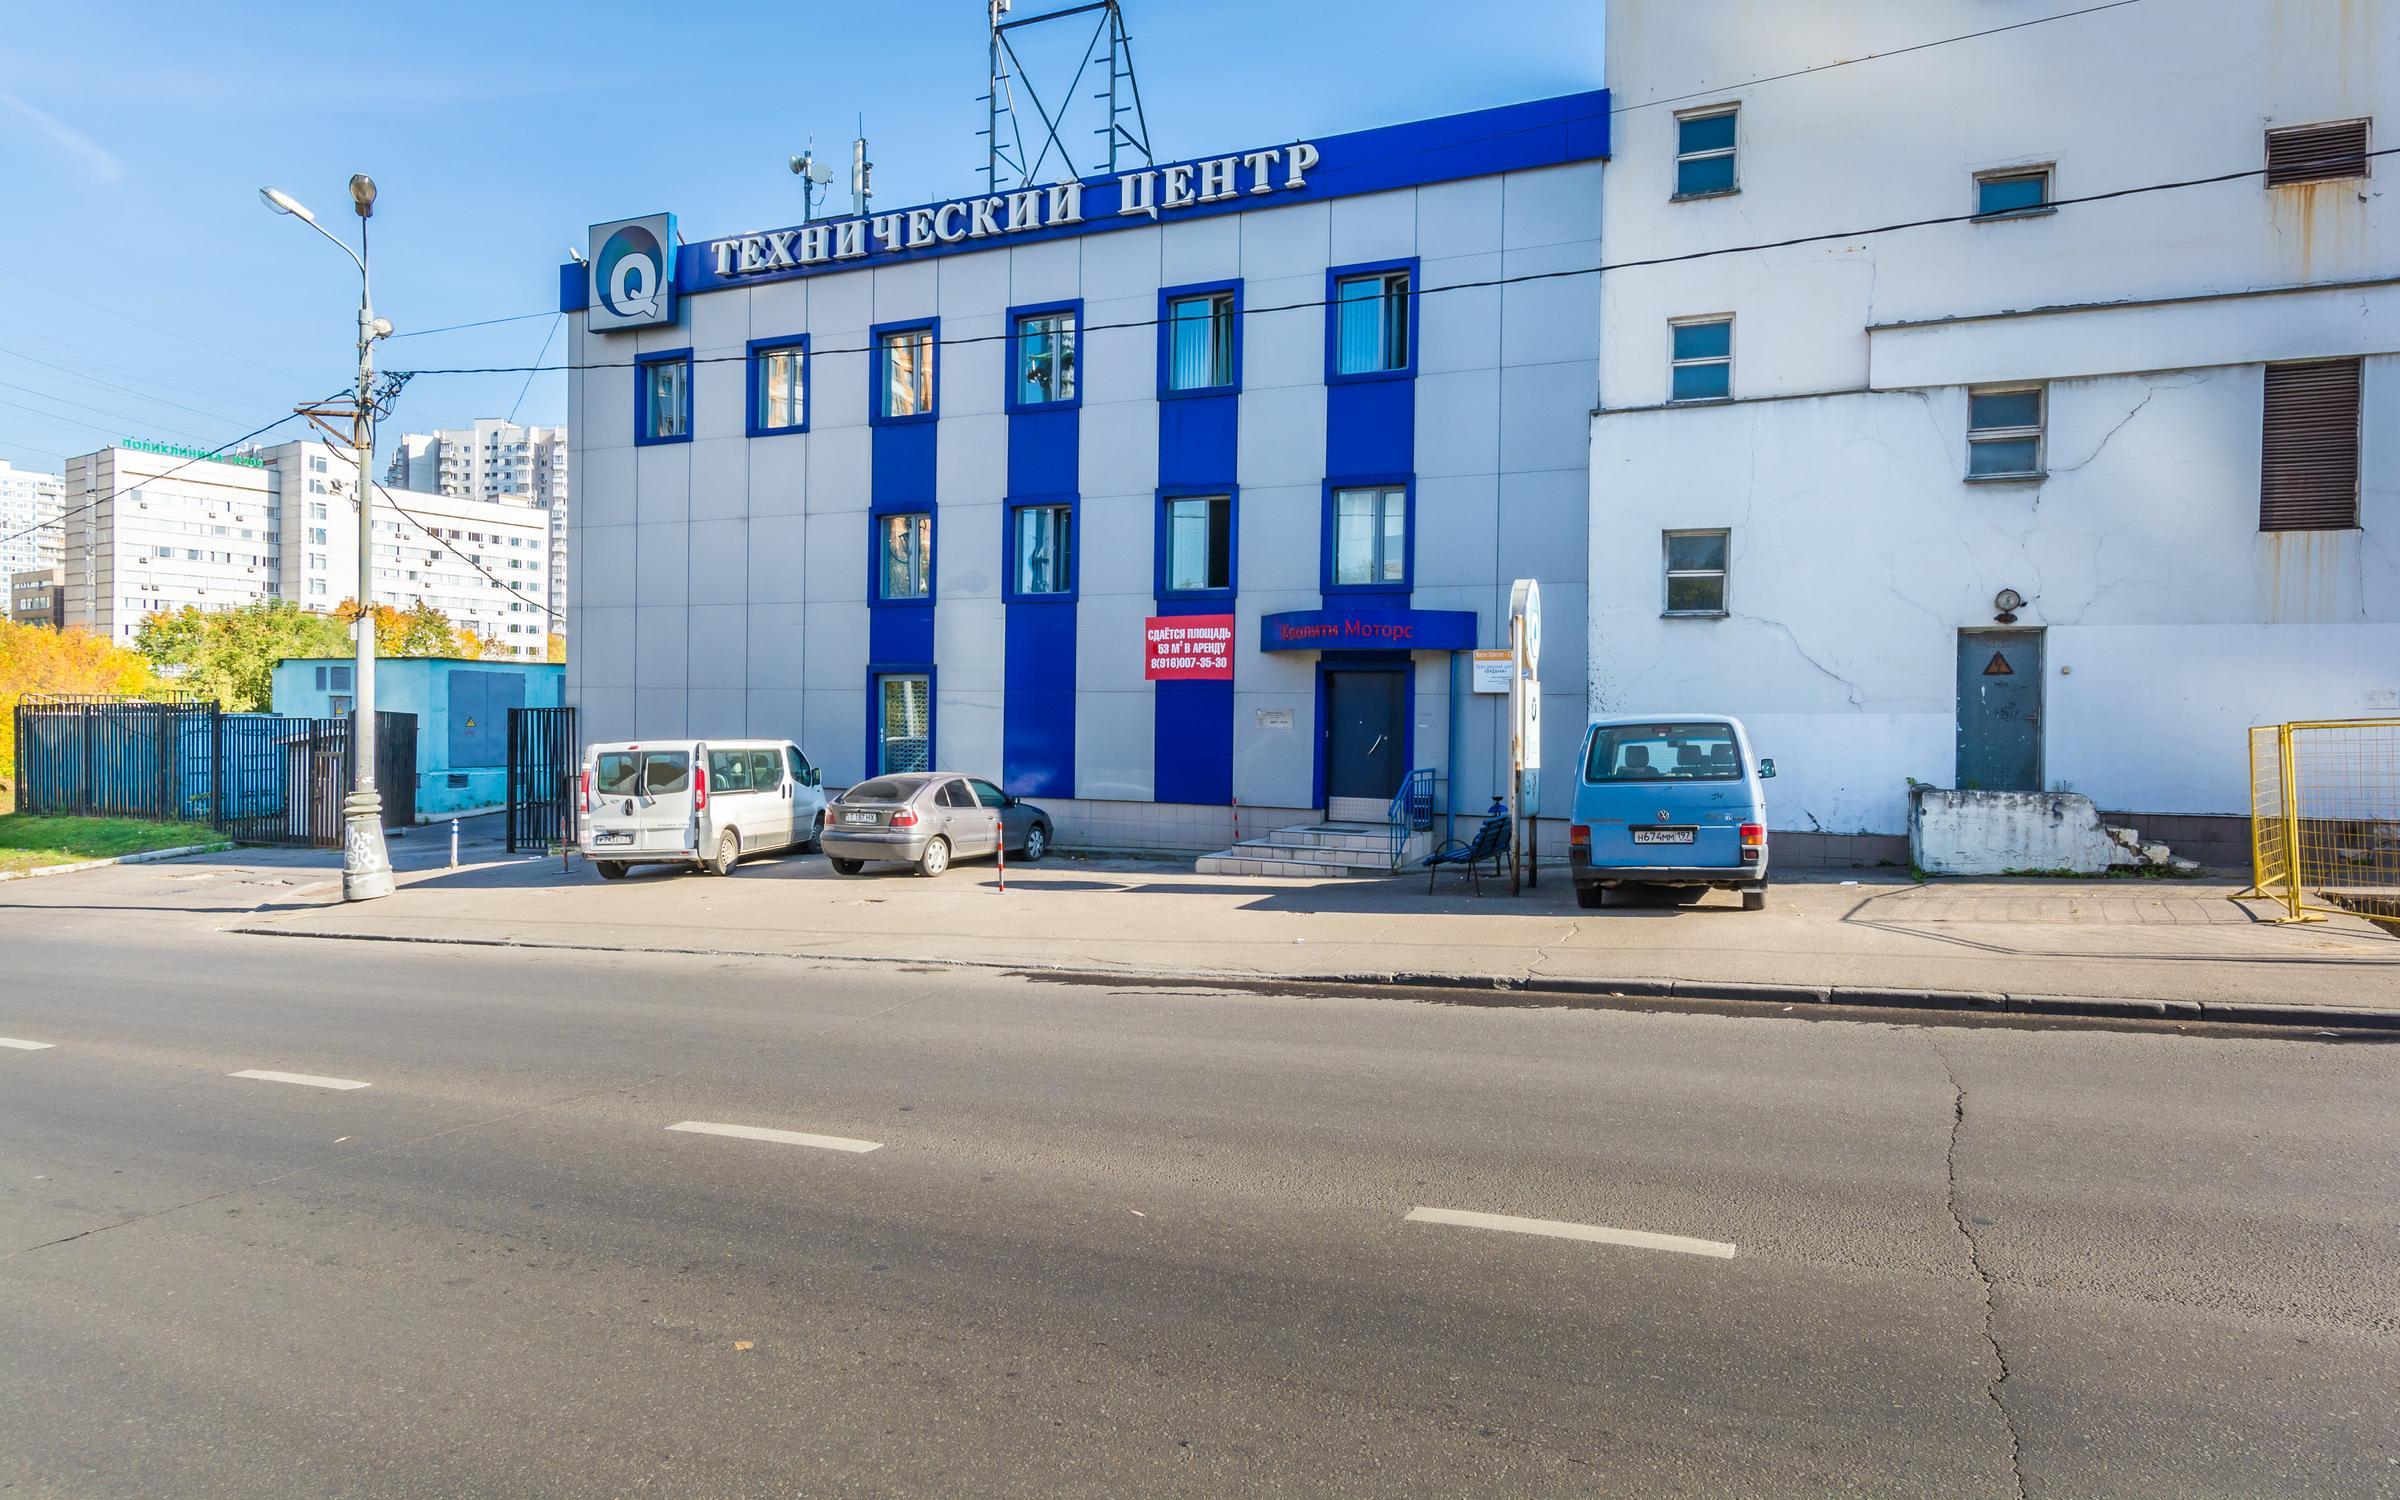 фотография Автосервиса М-Сервис на улице Удальцова, 60